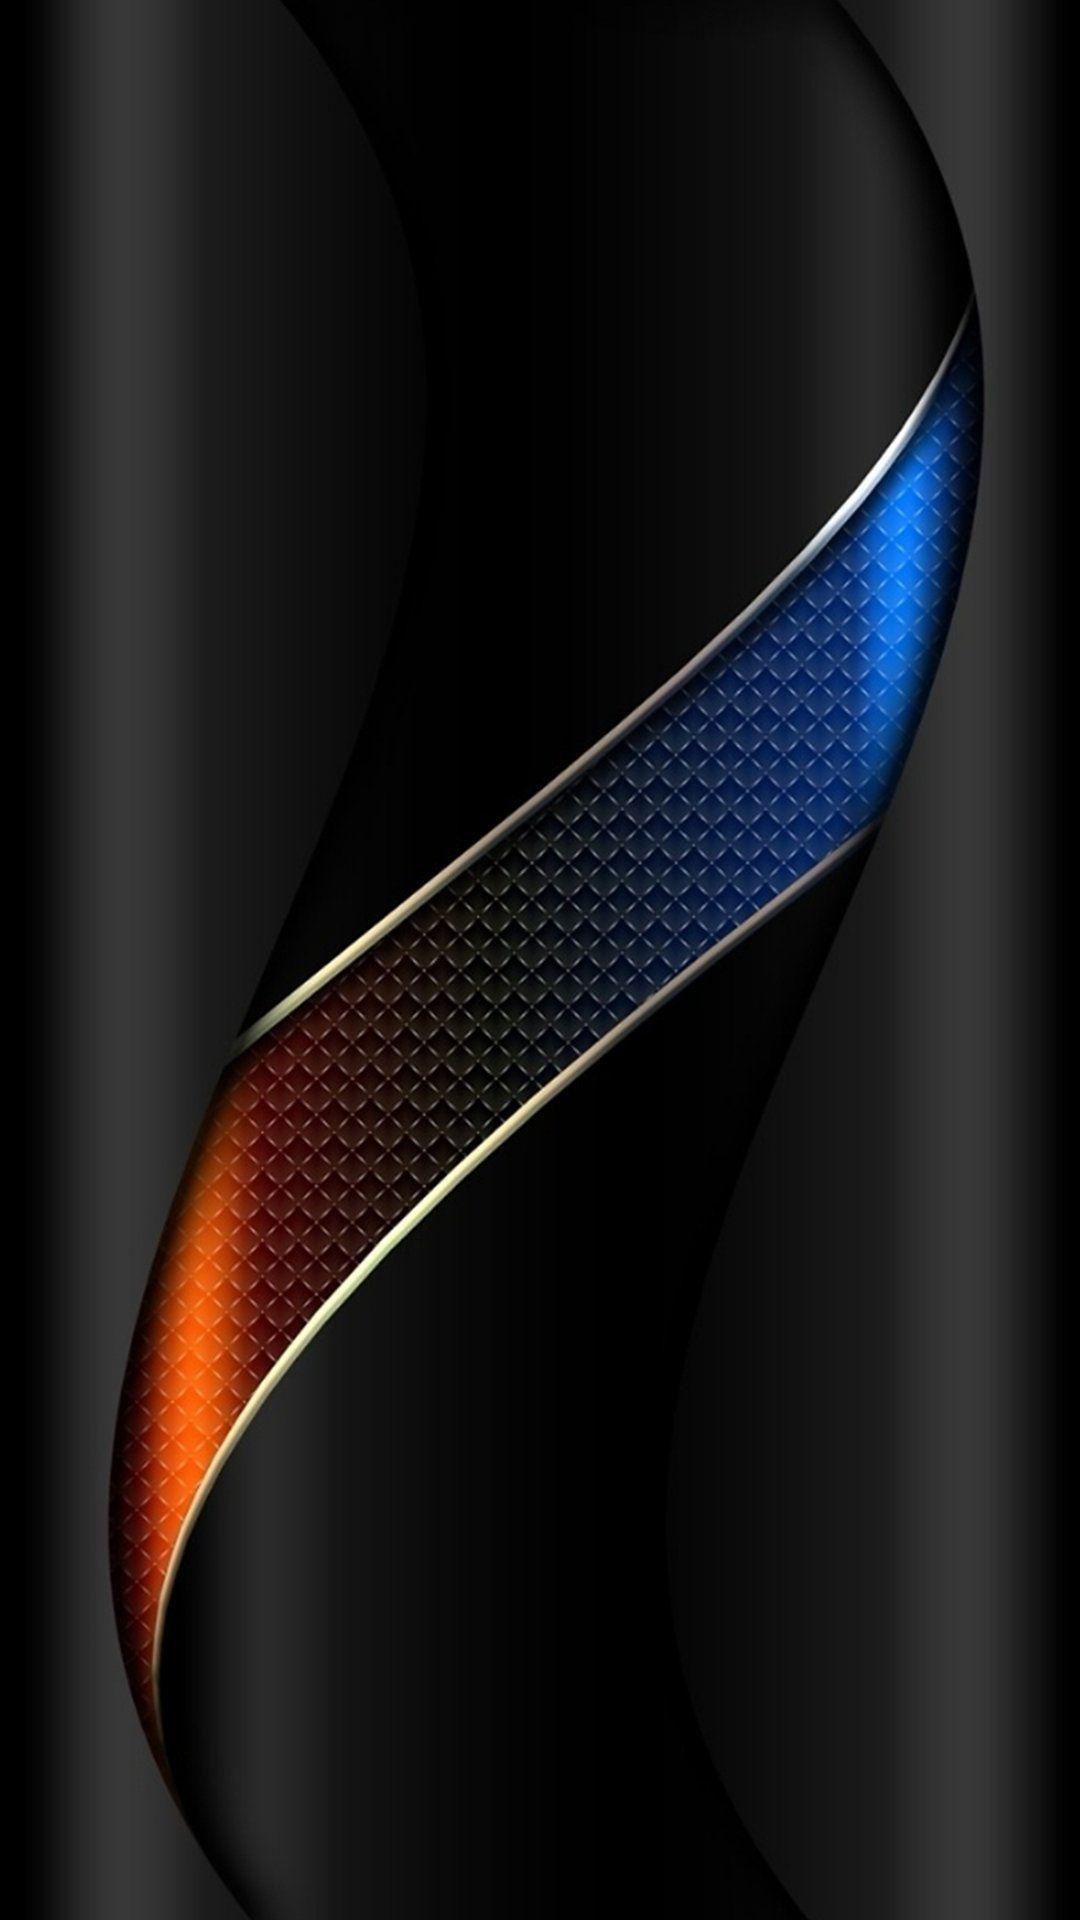 Black Blue Dark Wallpaper Pattern Galaxy Colour Abstract Digital Art S8 Walls Samsu Mobile Wallpaper Android Iphone 5s Wallpaper Galaxy S8 Wallpaper